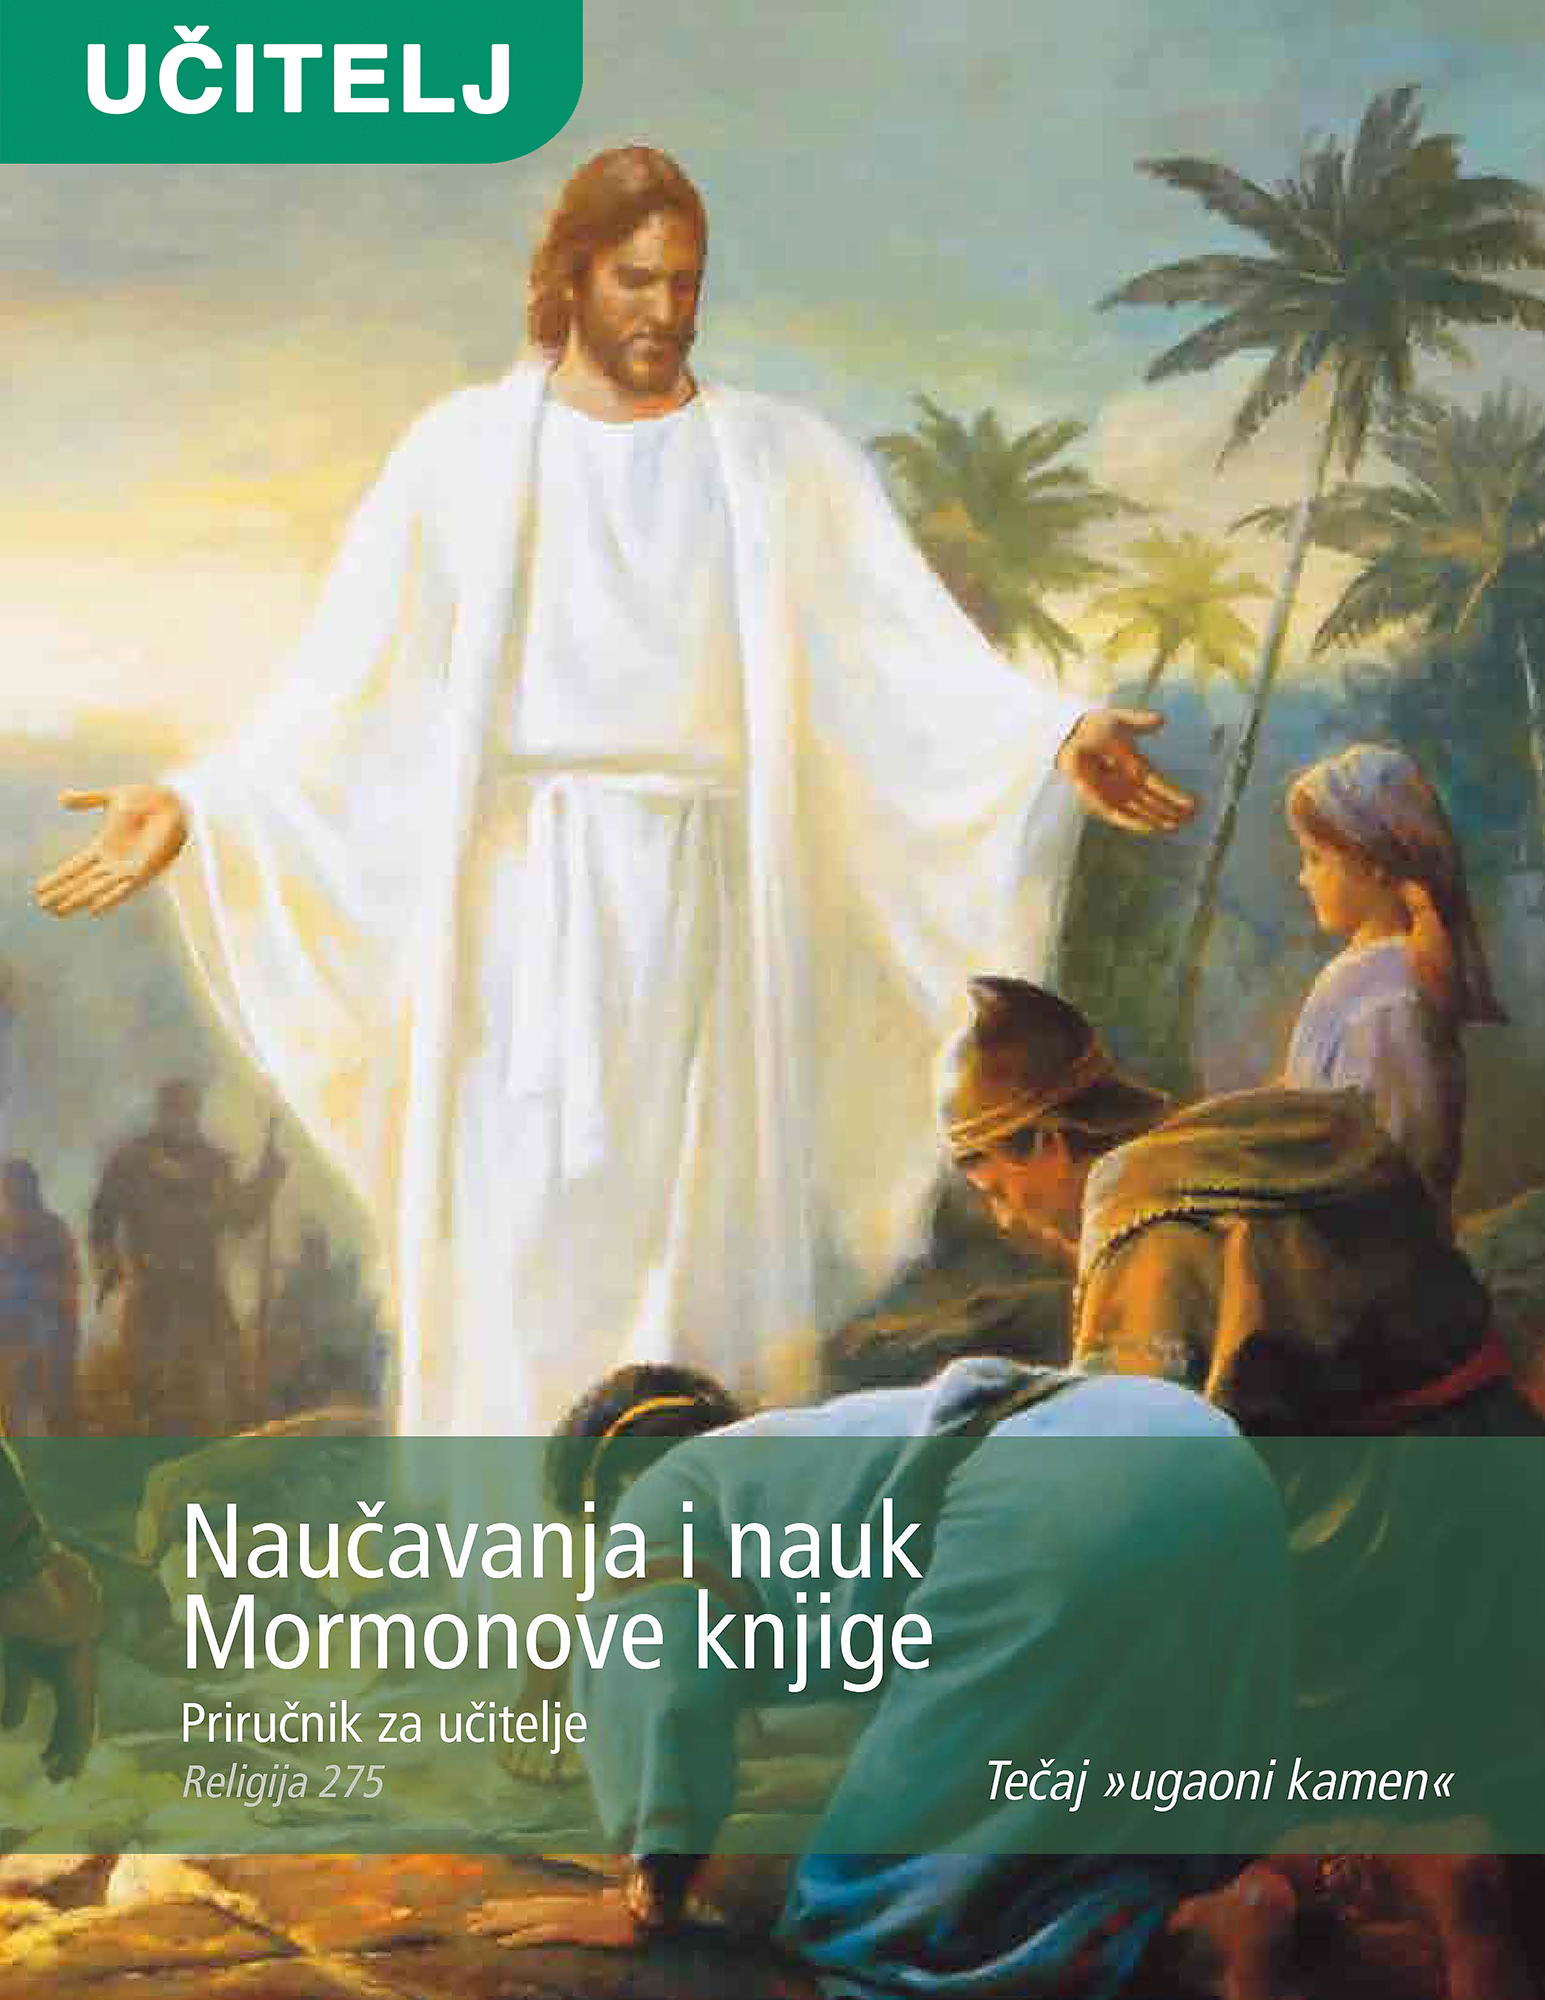 Naučavanja i nauk Mormonove knjige – priručnik za učitelje (Rel 275)